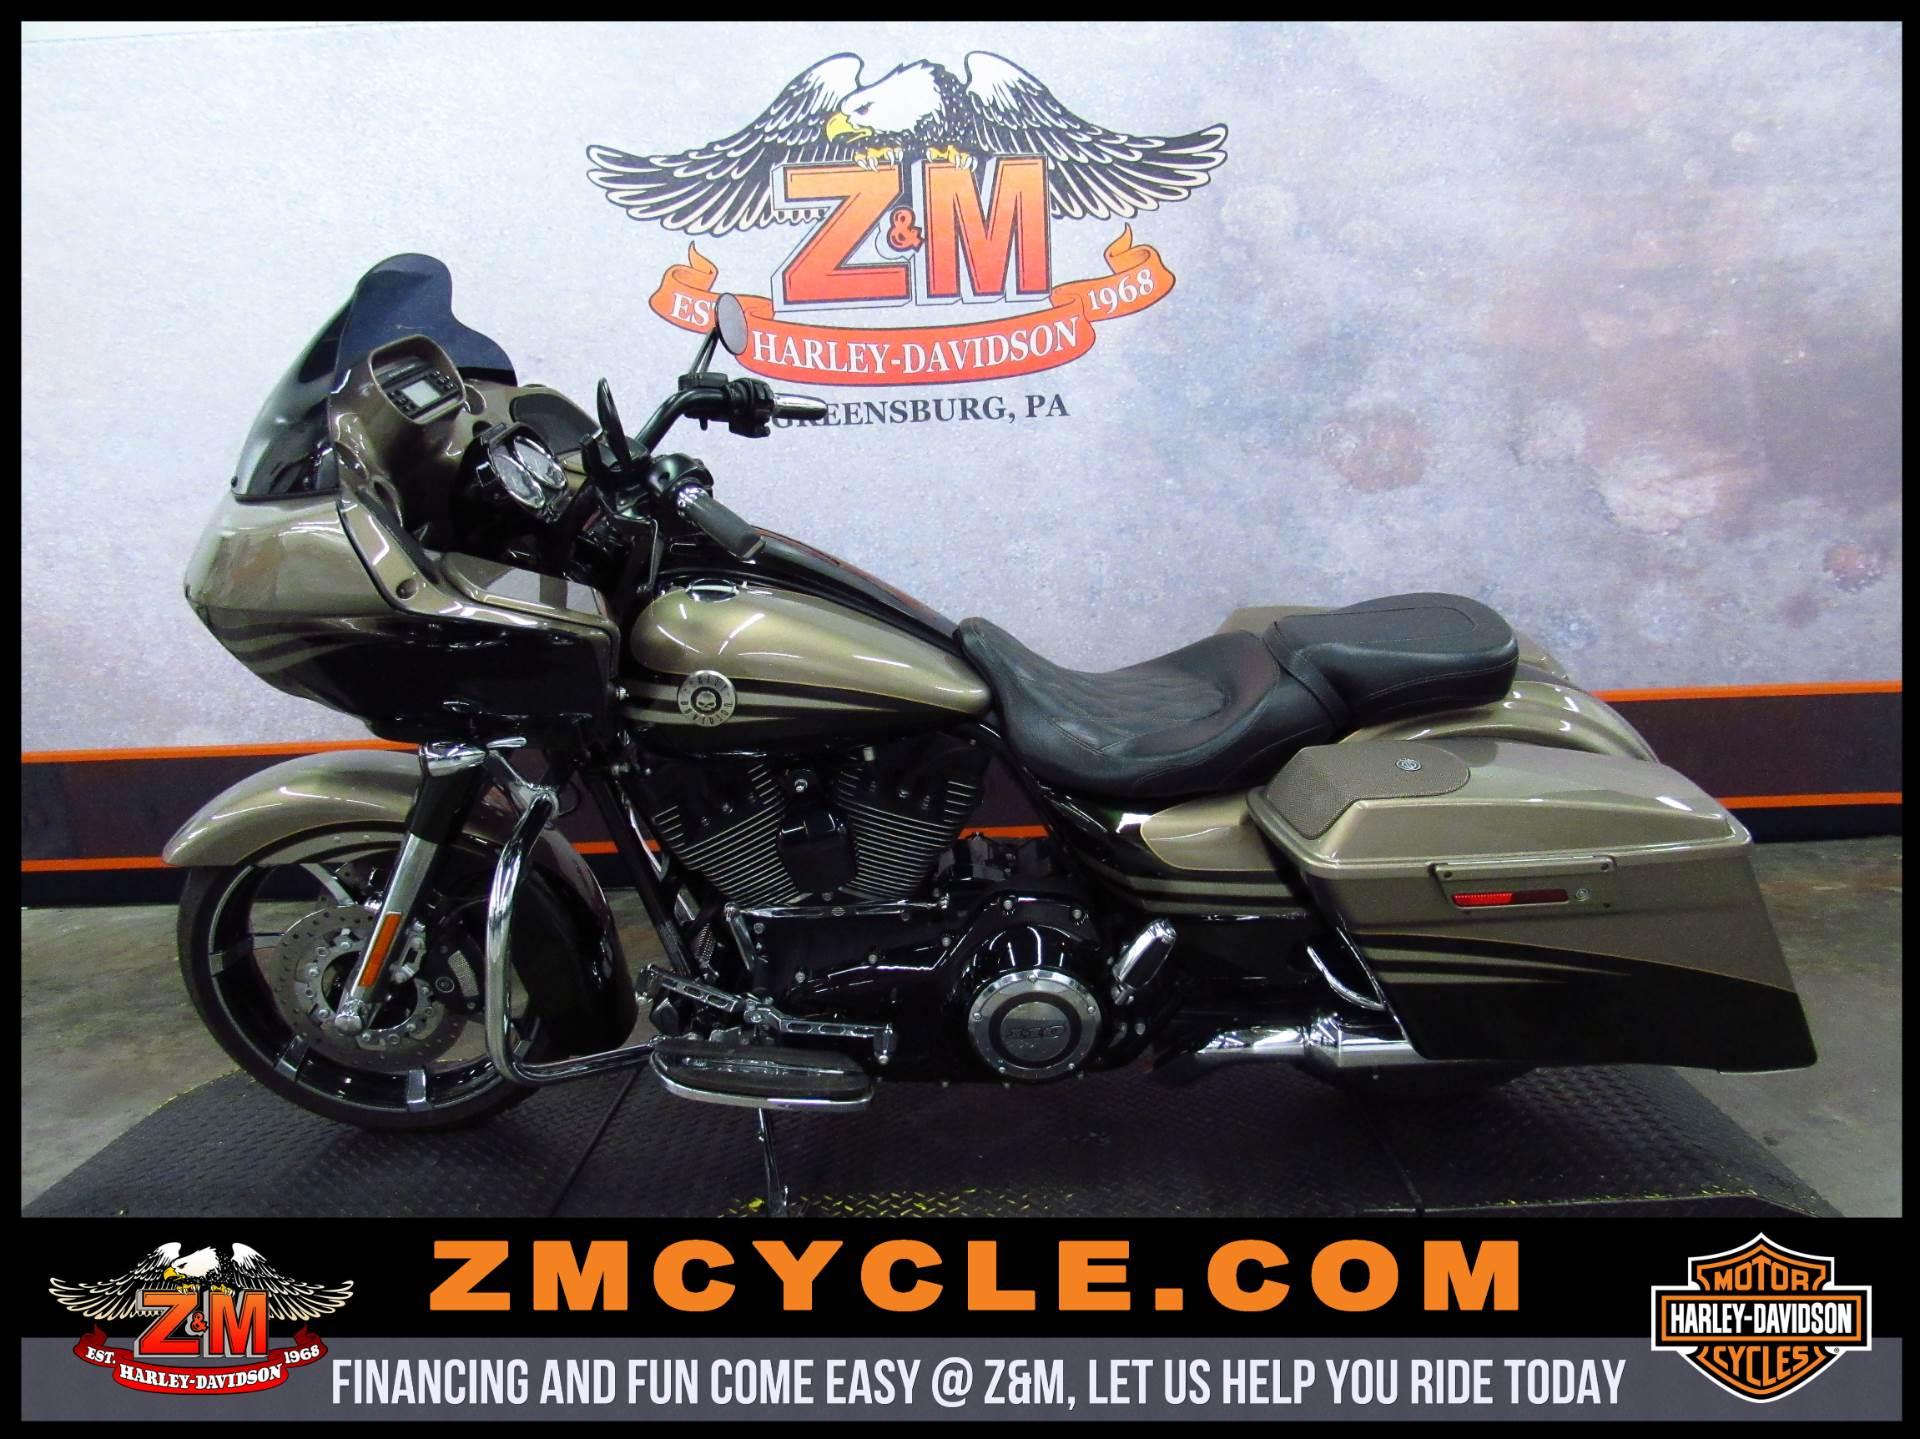 2013 Harley-Davidson CVO Road Glide Custom 4